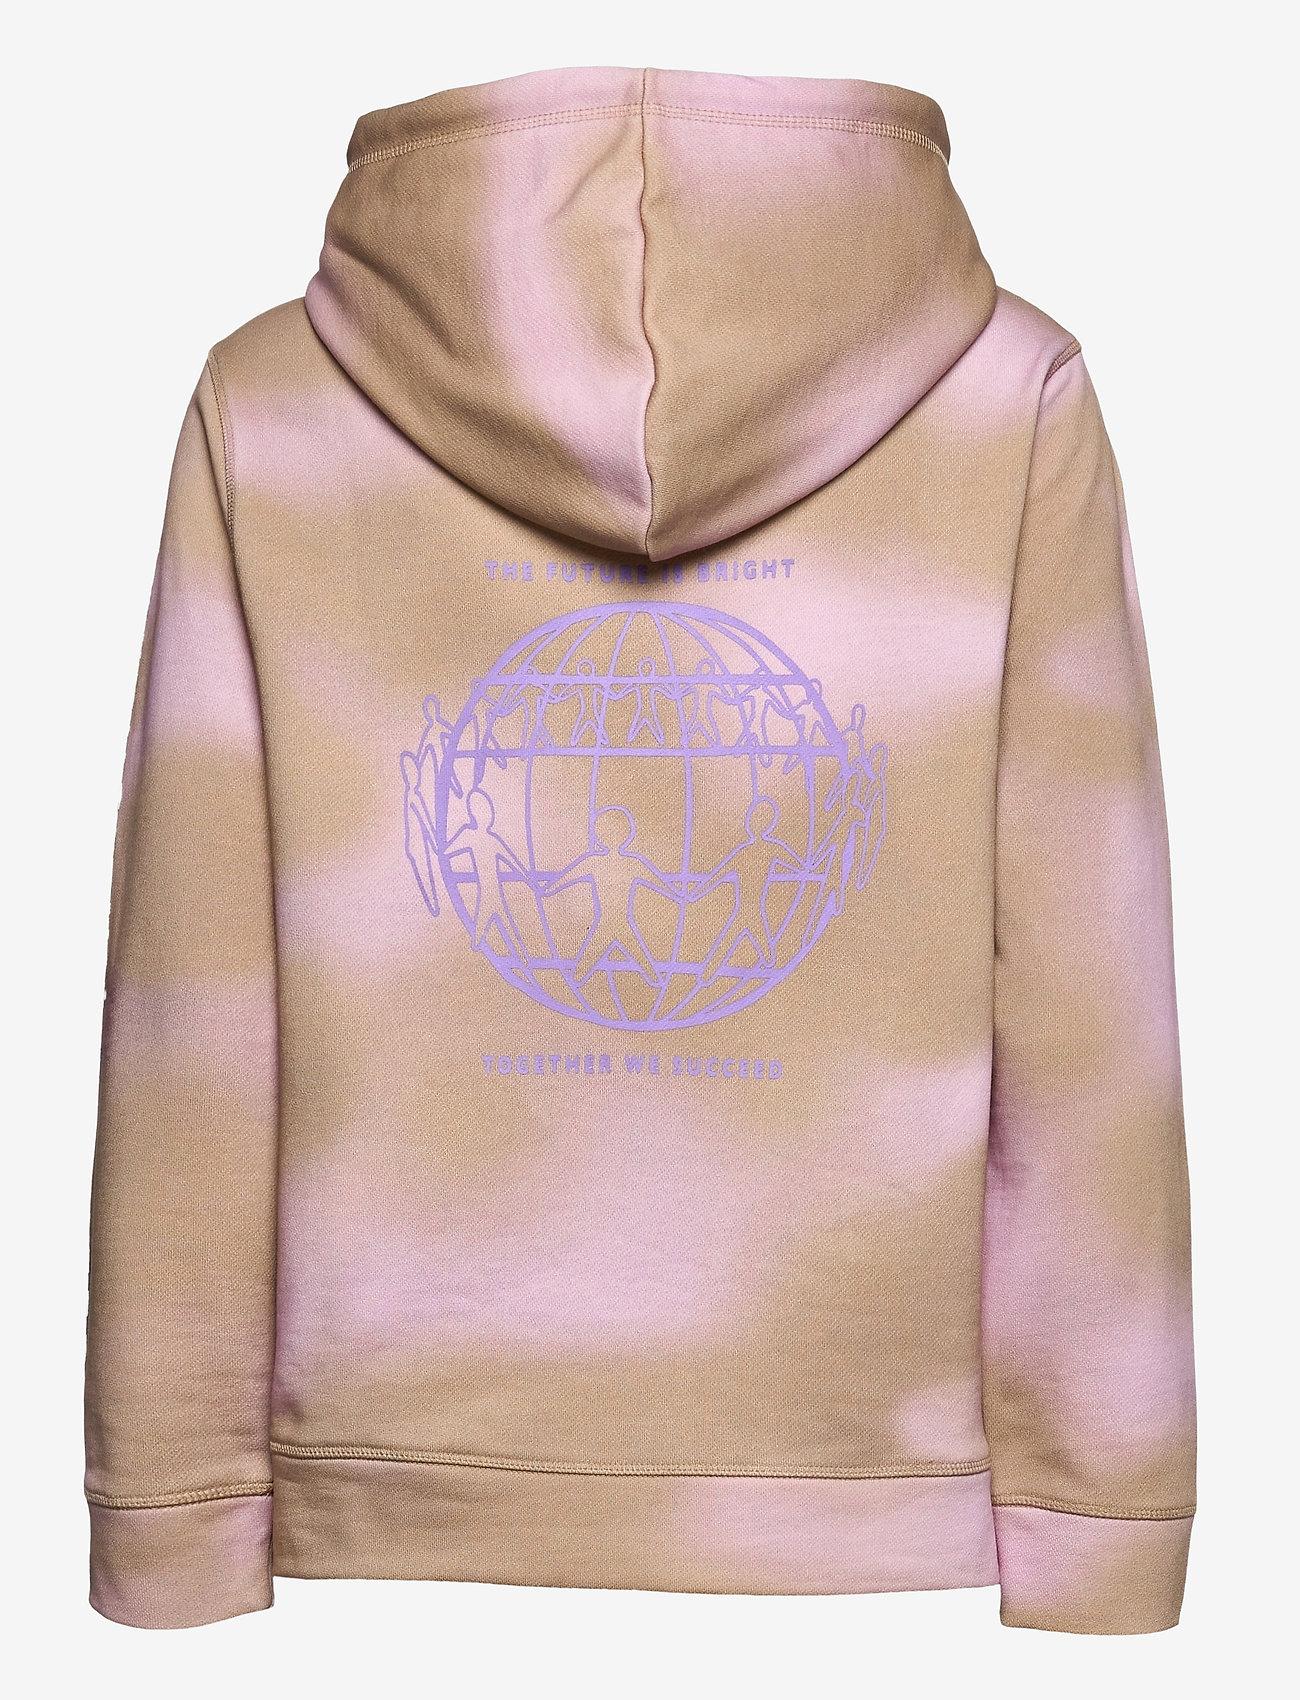 Tommy Hilfiger - ABO EARTH DAY HOODIE - sweatshirts & hættetrøjer - gentle gold / pastel pink prt - 1